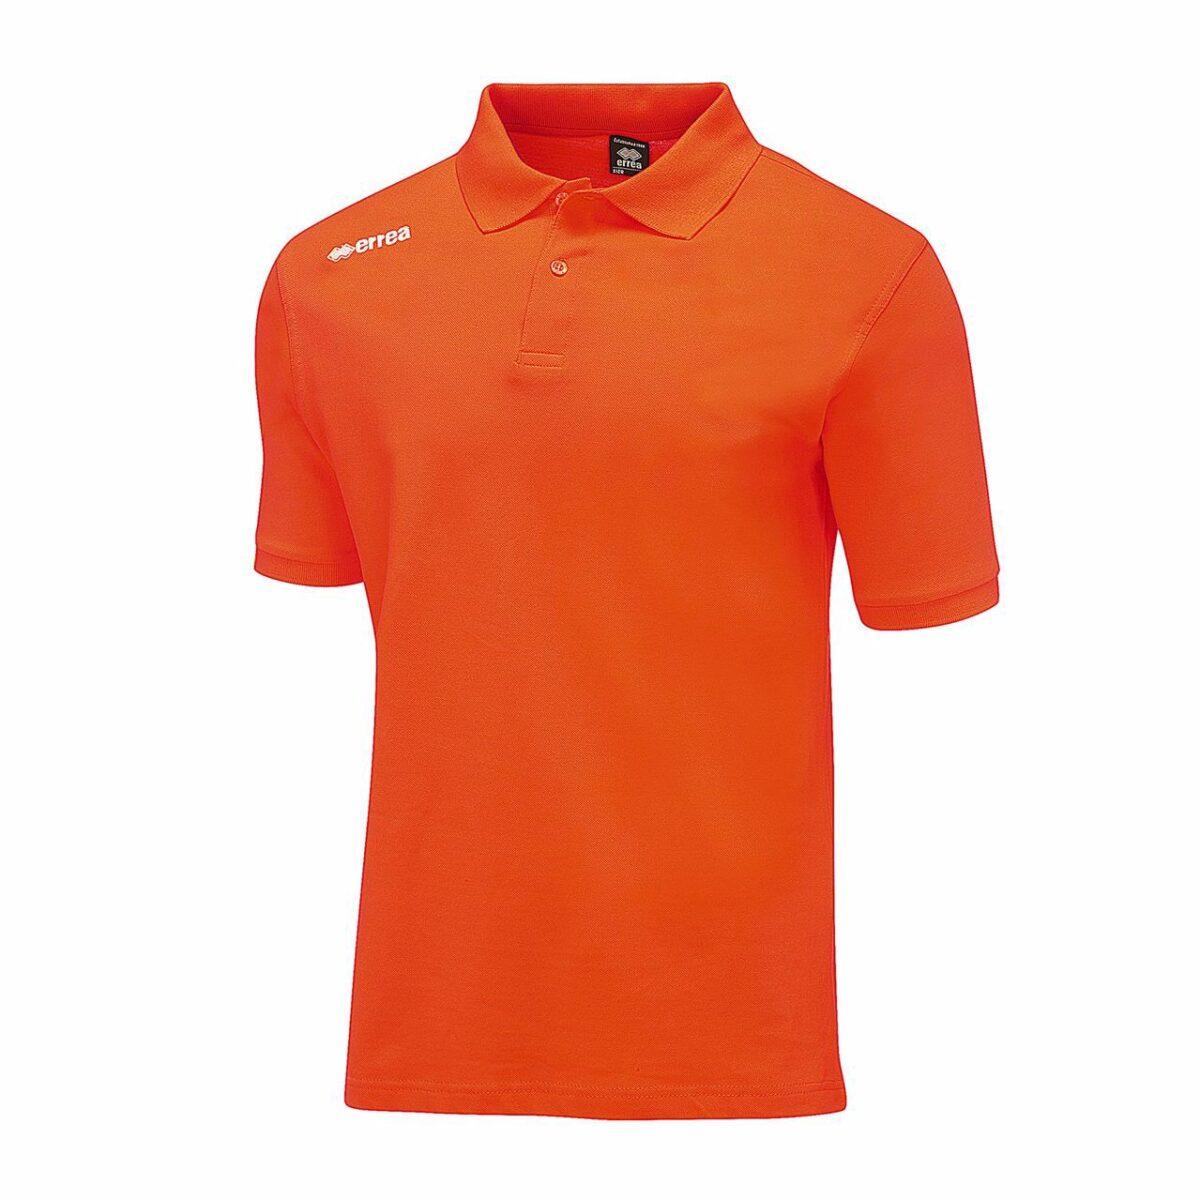 Errea Junior Team Colours Polo Shirt D2101